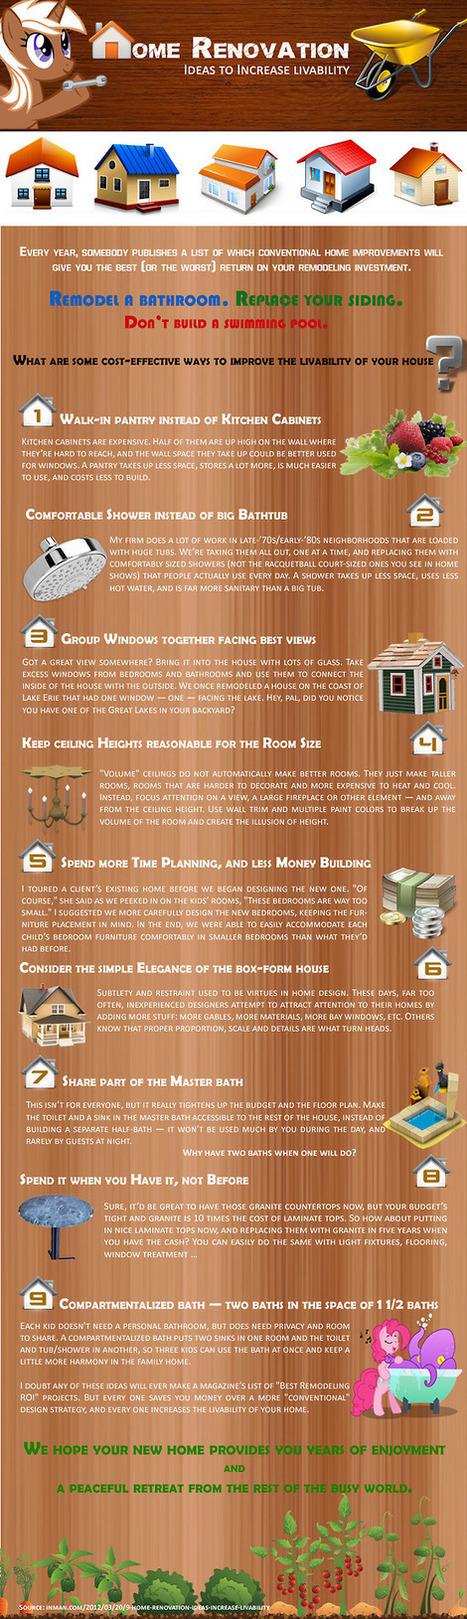 Home-Renovation Tips! http://goo.gl/gnPjkX - Find a Trade | Modern Art Homes | Scoop.it